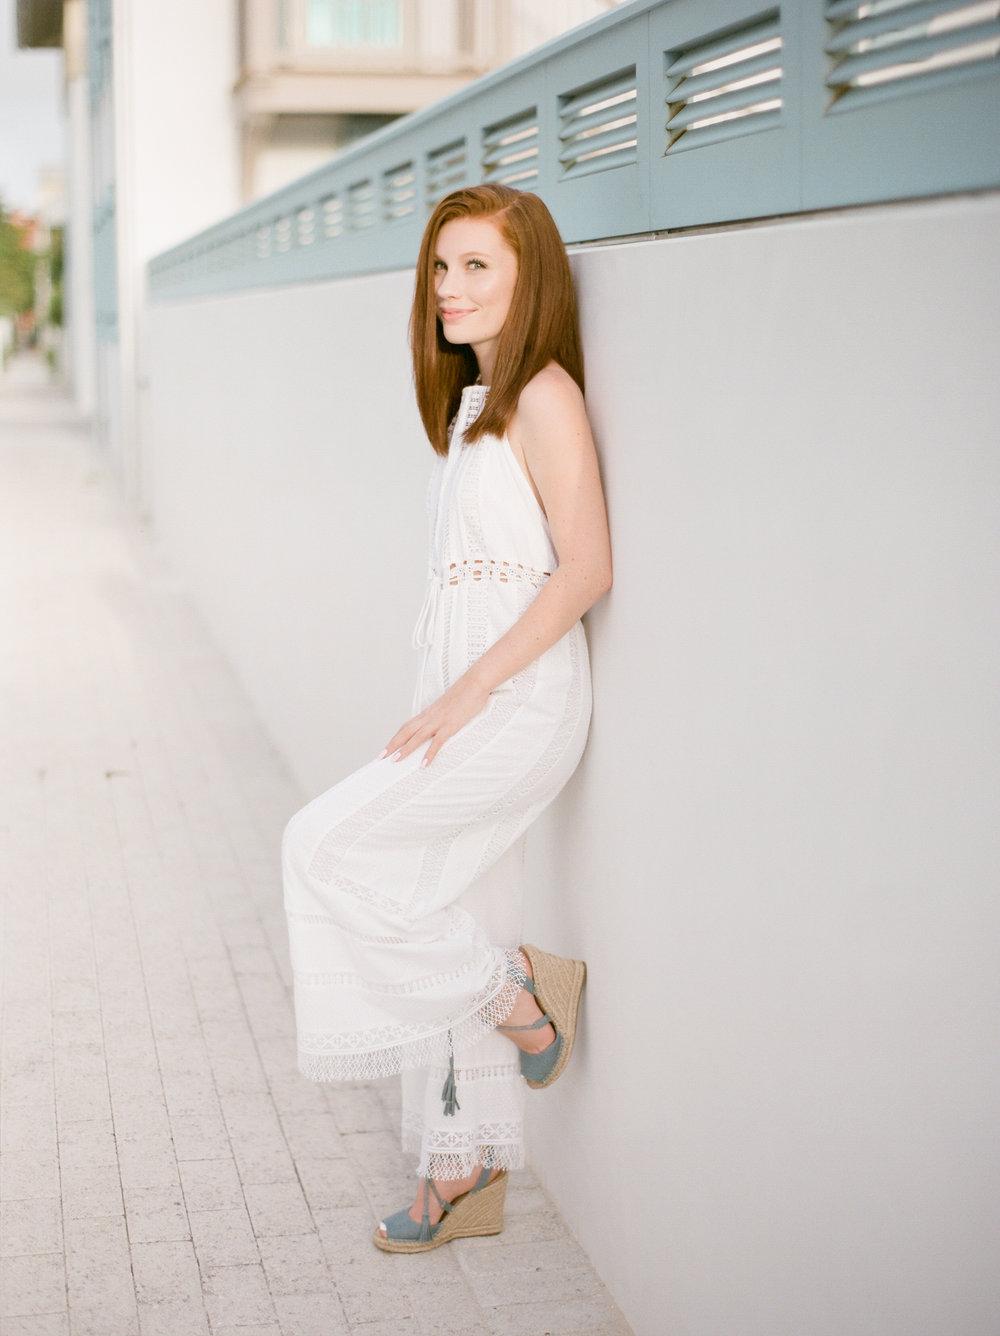 rosemarybeach-fl-film-photographer-kayliebpoplin